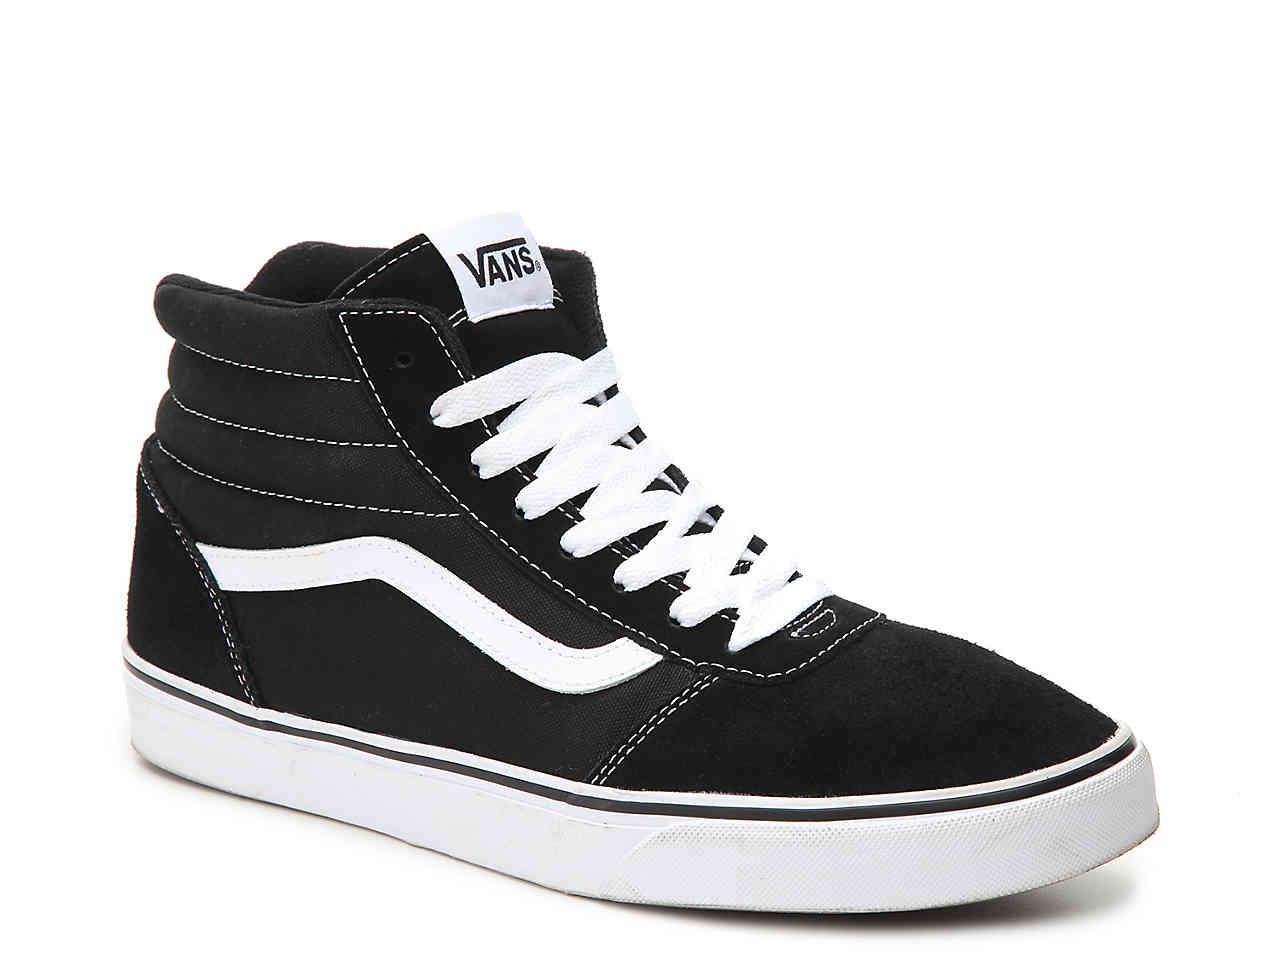 e807a9e41299d6 Lyst - Vans Ward Hi Suede High-top Sneaker in Black for Men